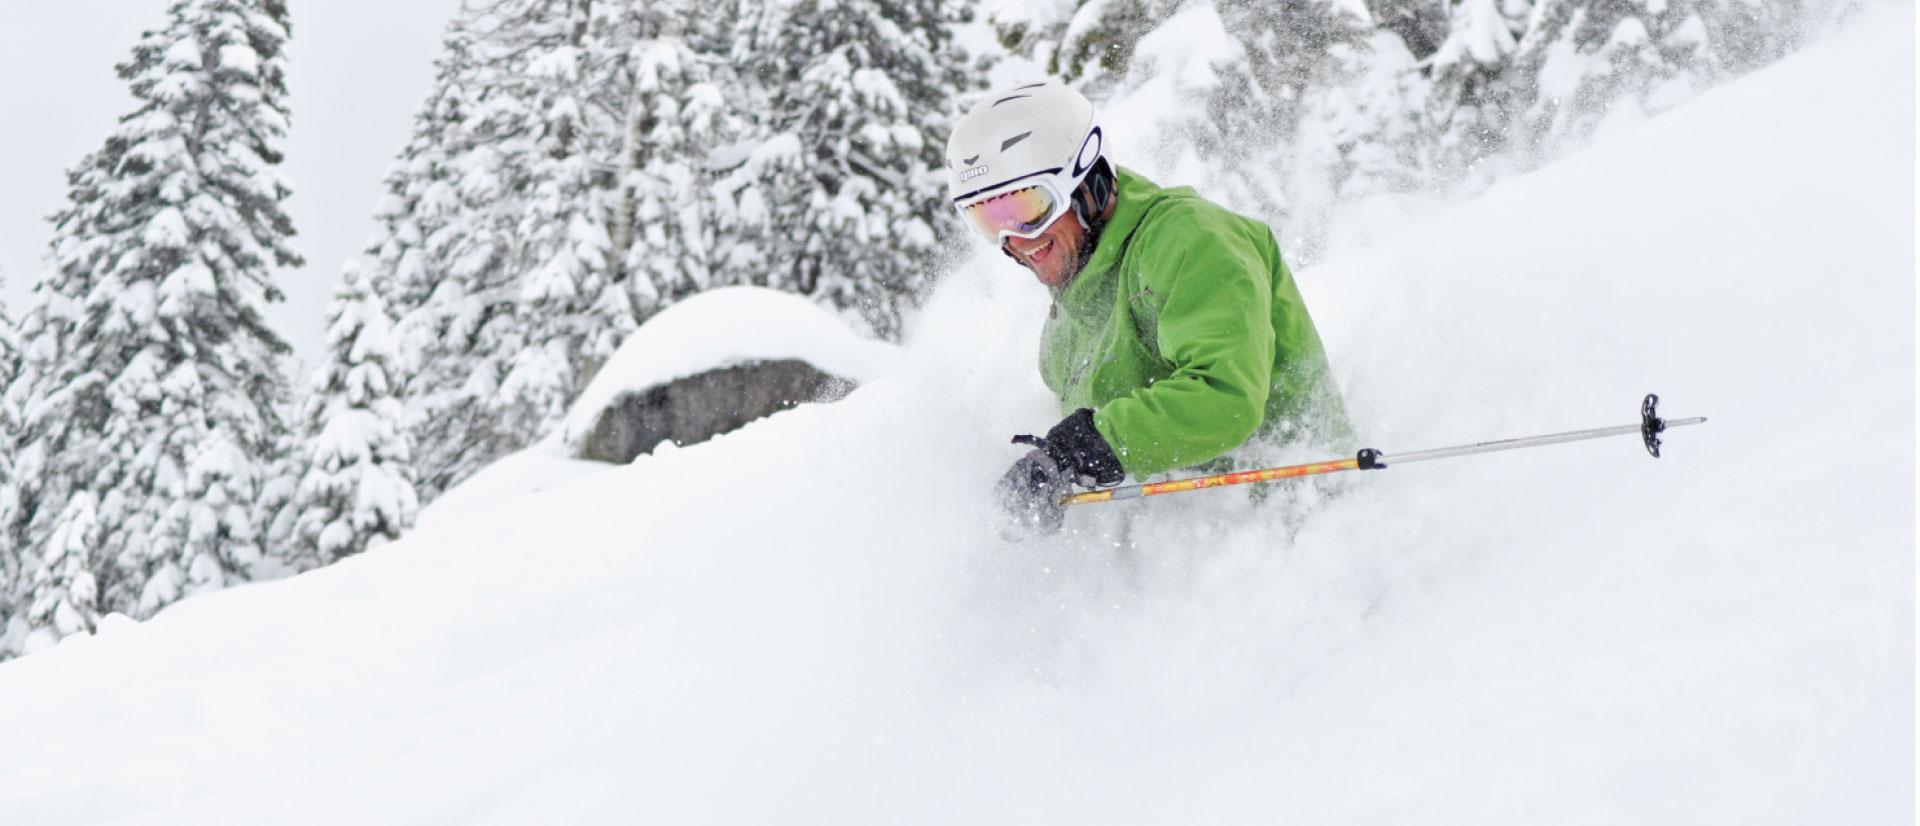 Dodge Ridge Ski Area Jobs - Employment Opportunities